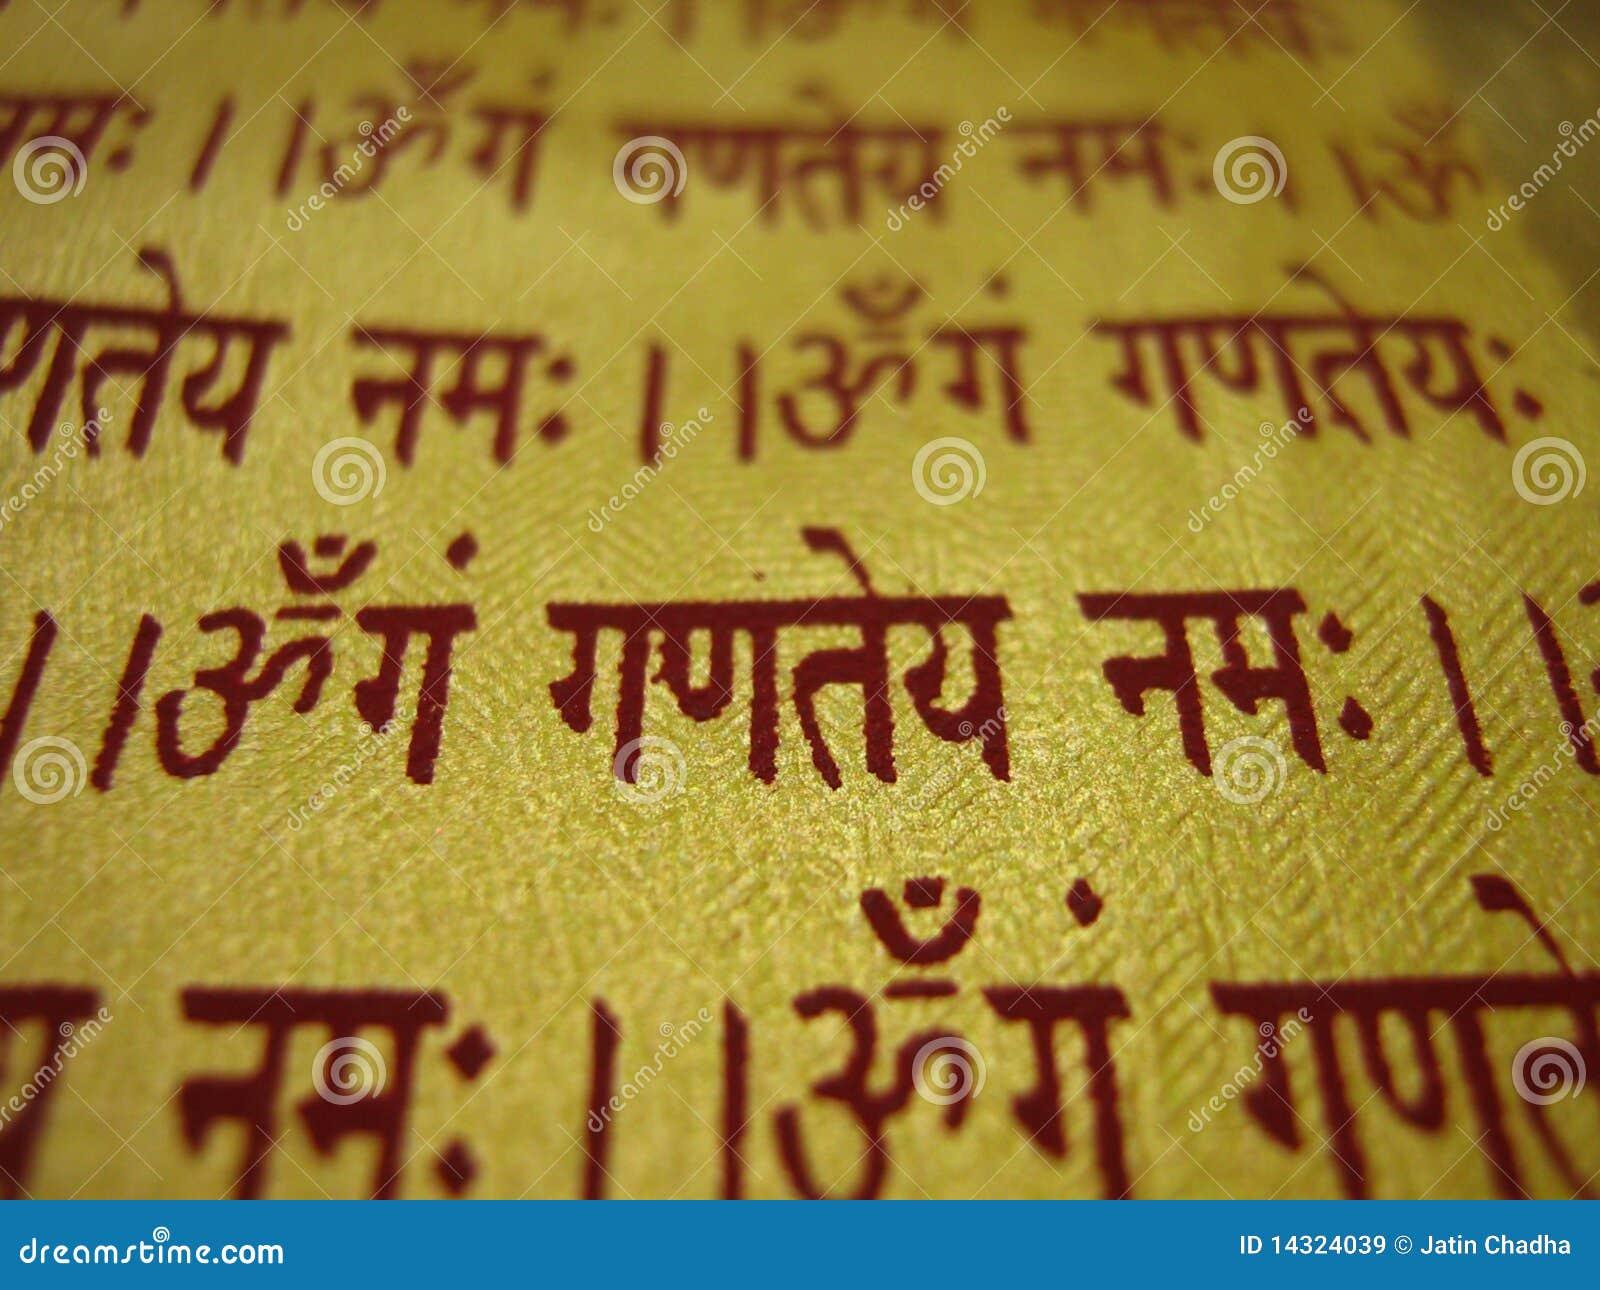 Divine chants of shiva mp3 free download